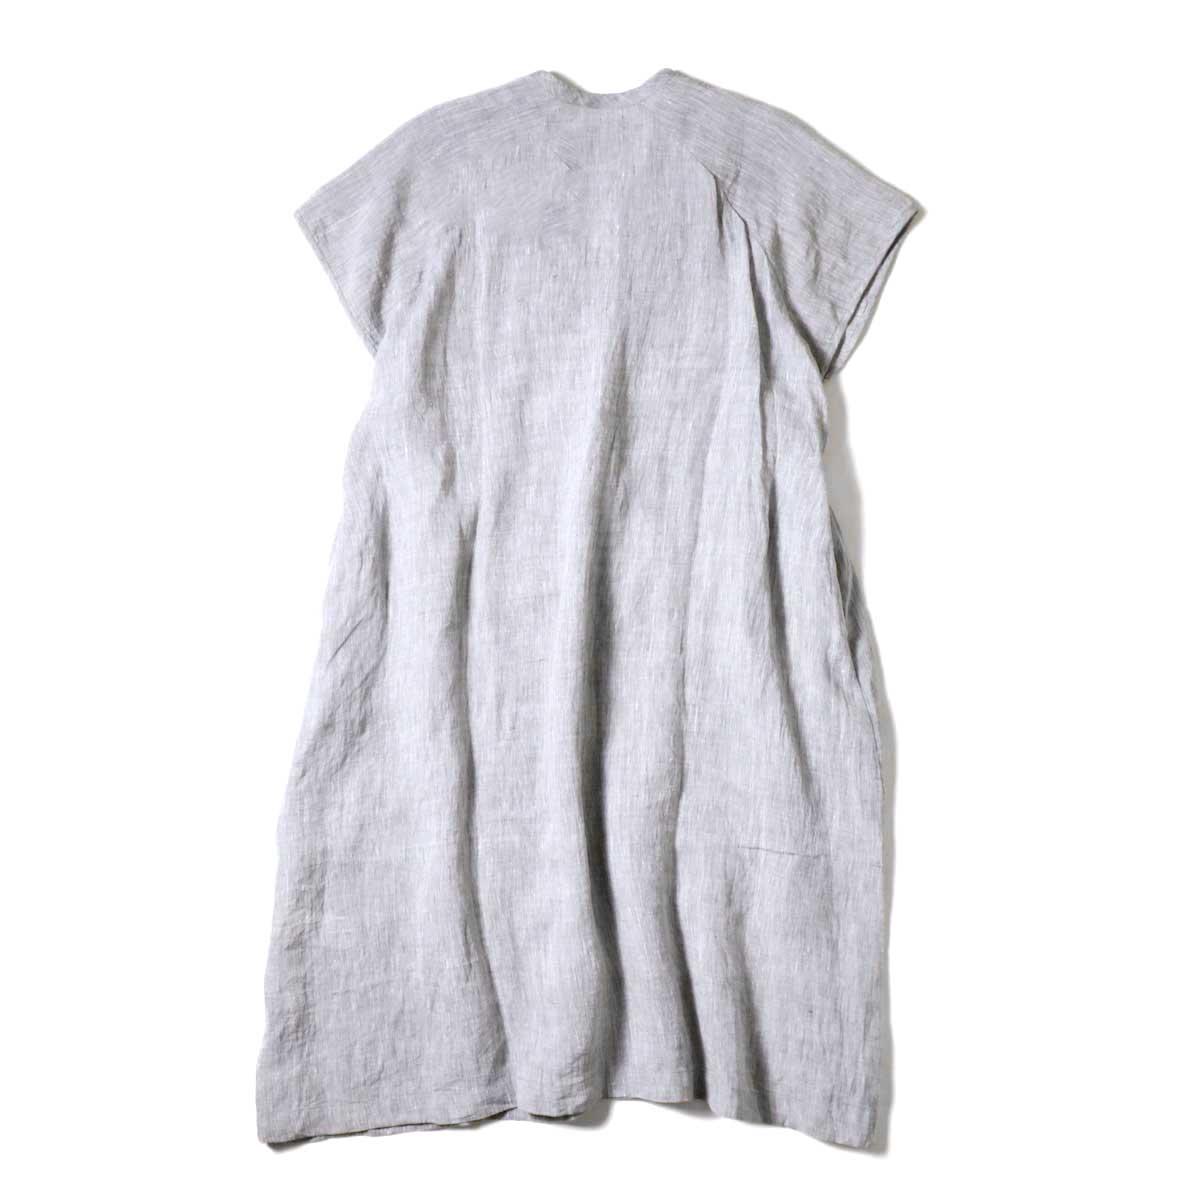 SOIL / V-NECK PINTUCK DREES (Grey) 背面